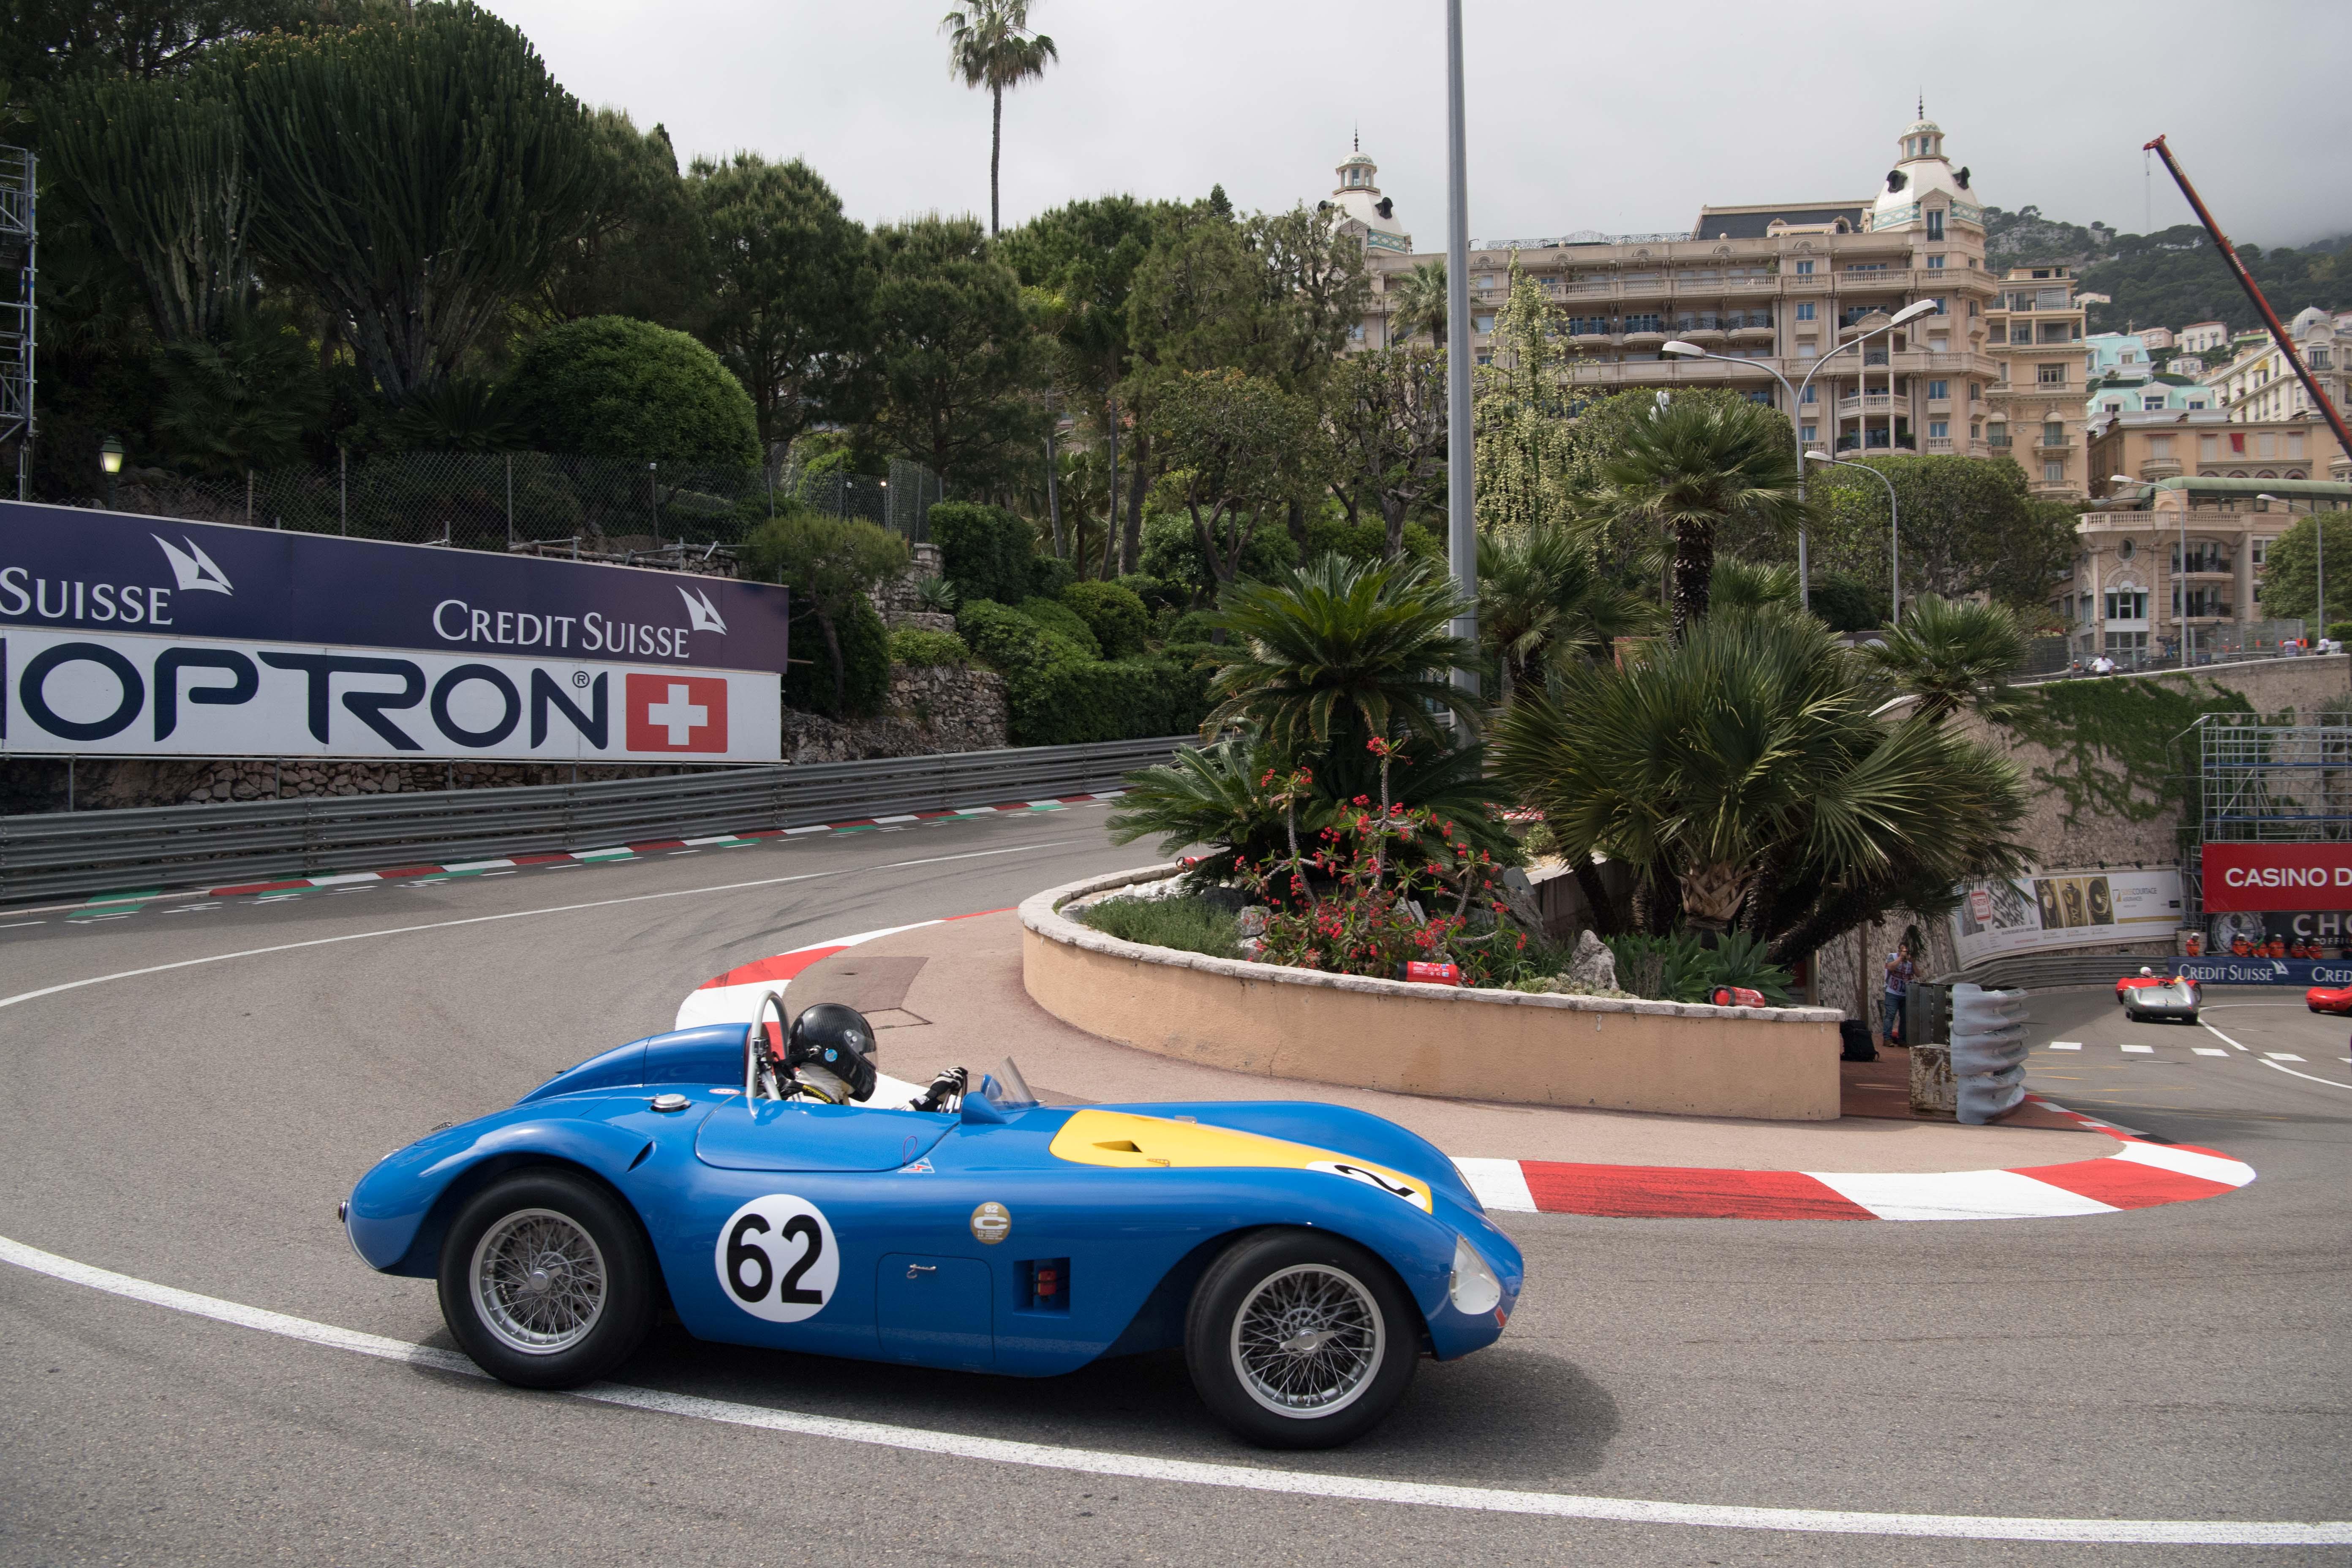 1561512_Grand_Prix_Maserati_A6GCS_ReneBertoPhoto